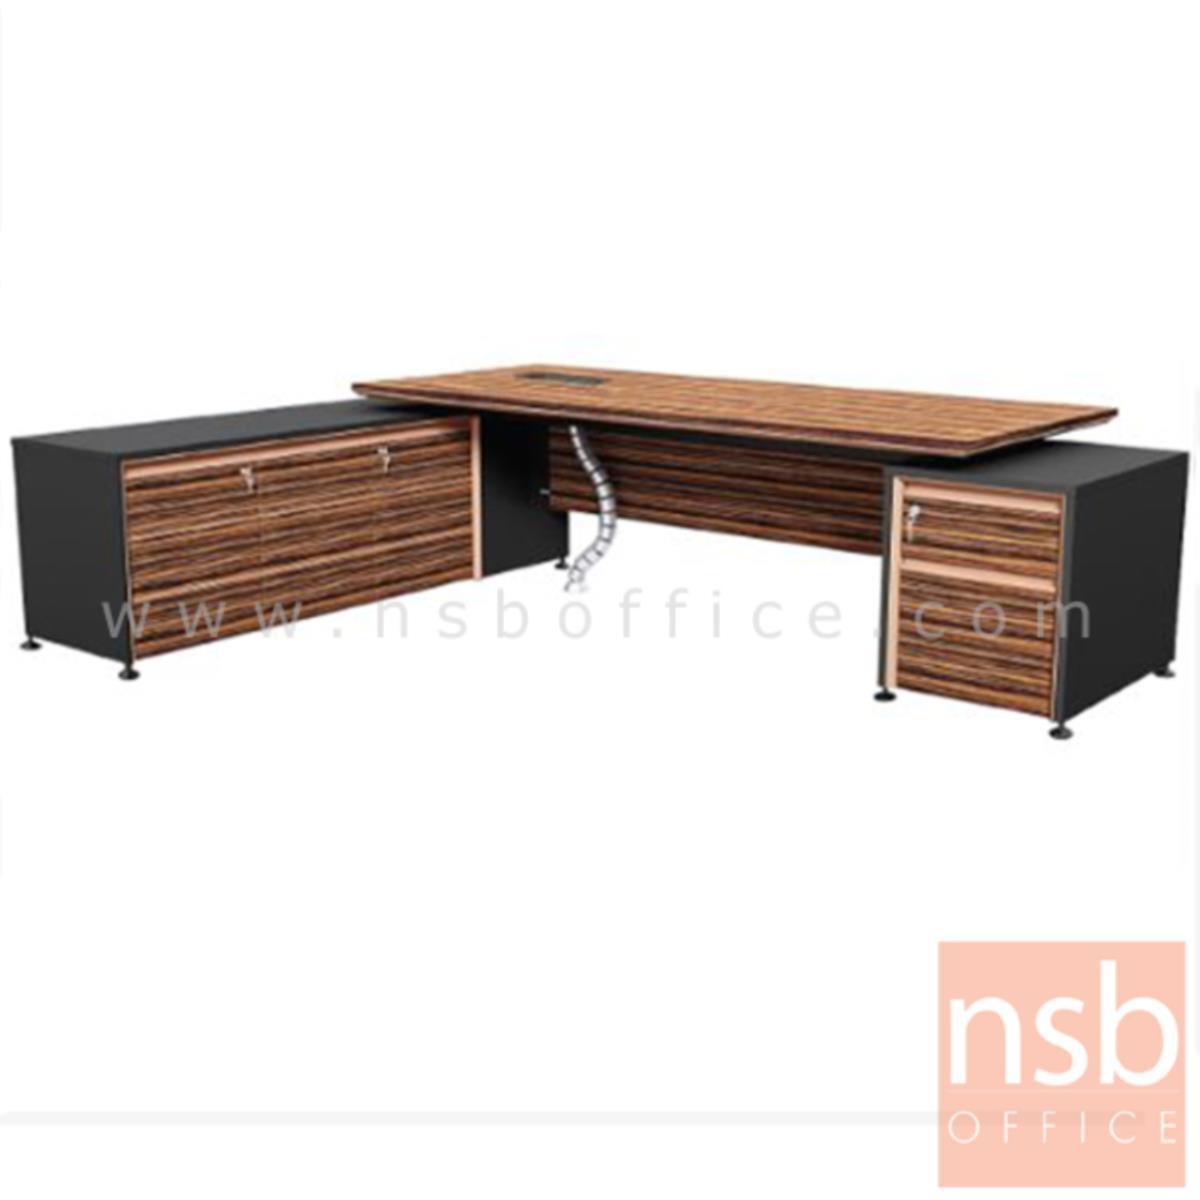 A26A002:โต๊ะผู้บริหารตัวแอล  รุ่น Extrême ขนาด 289.5W cm. พร้อมบังตา สีลายไม้ซีบราโน่ตัดดำ ขอบ ROSEGOLD